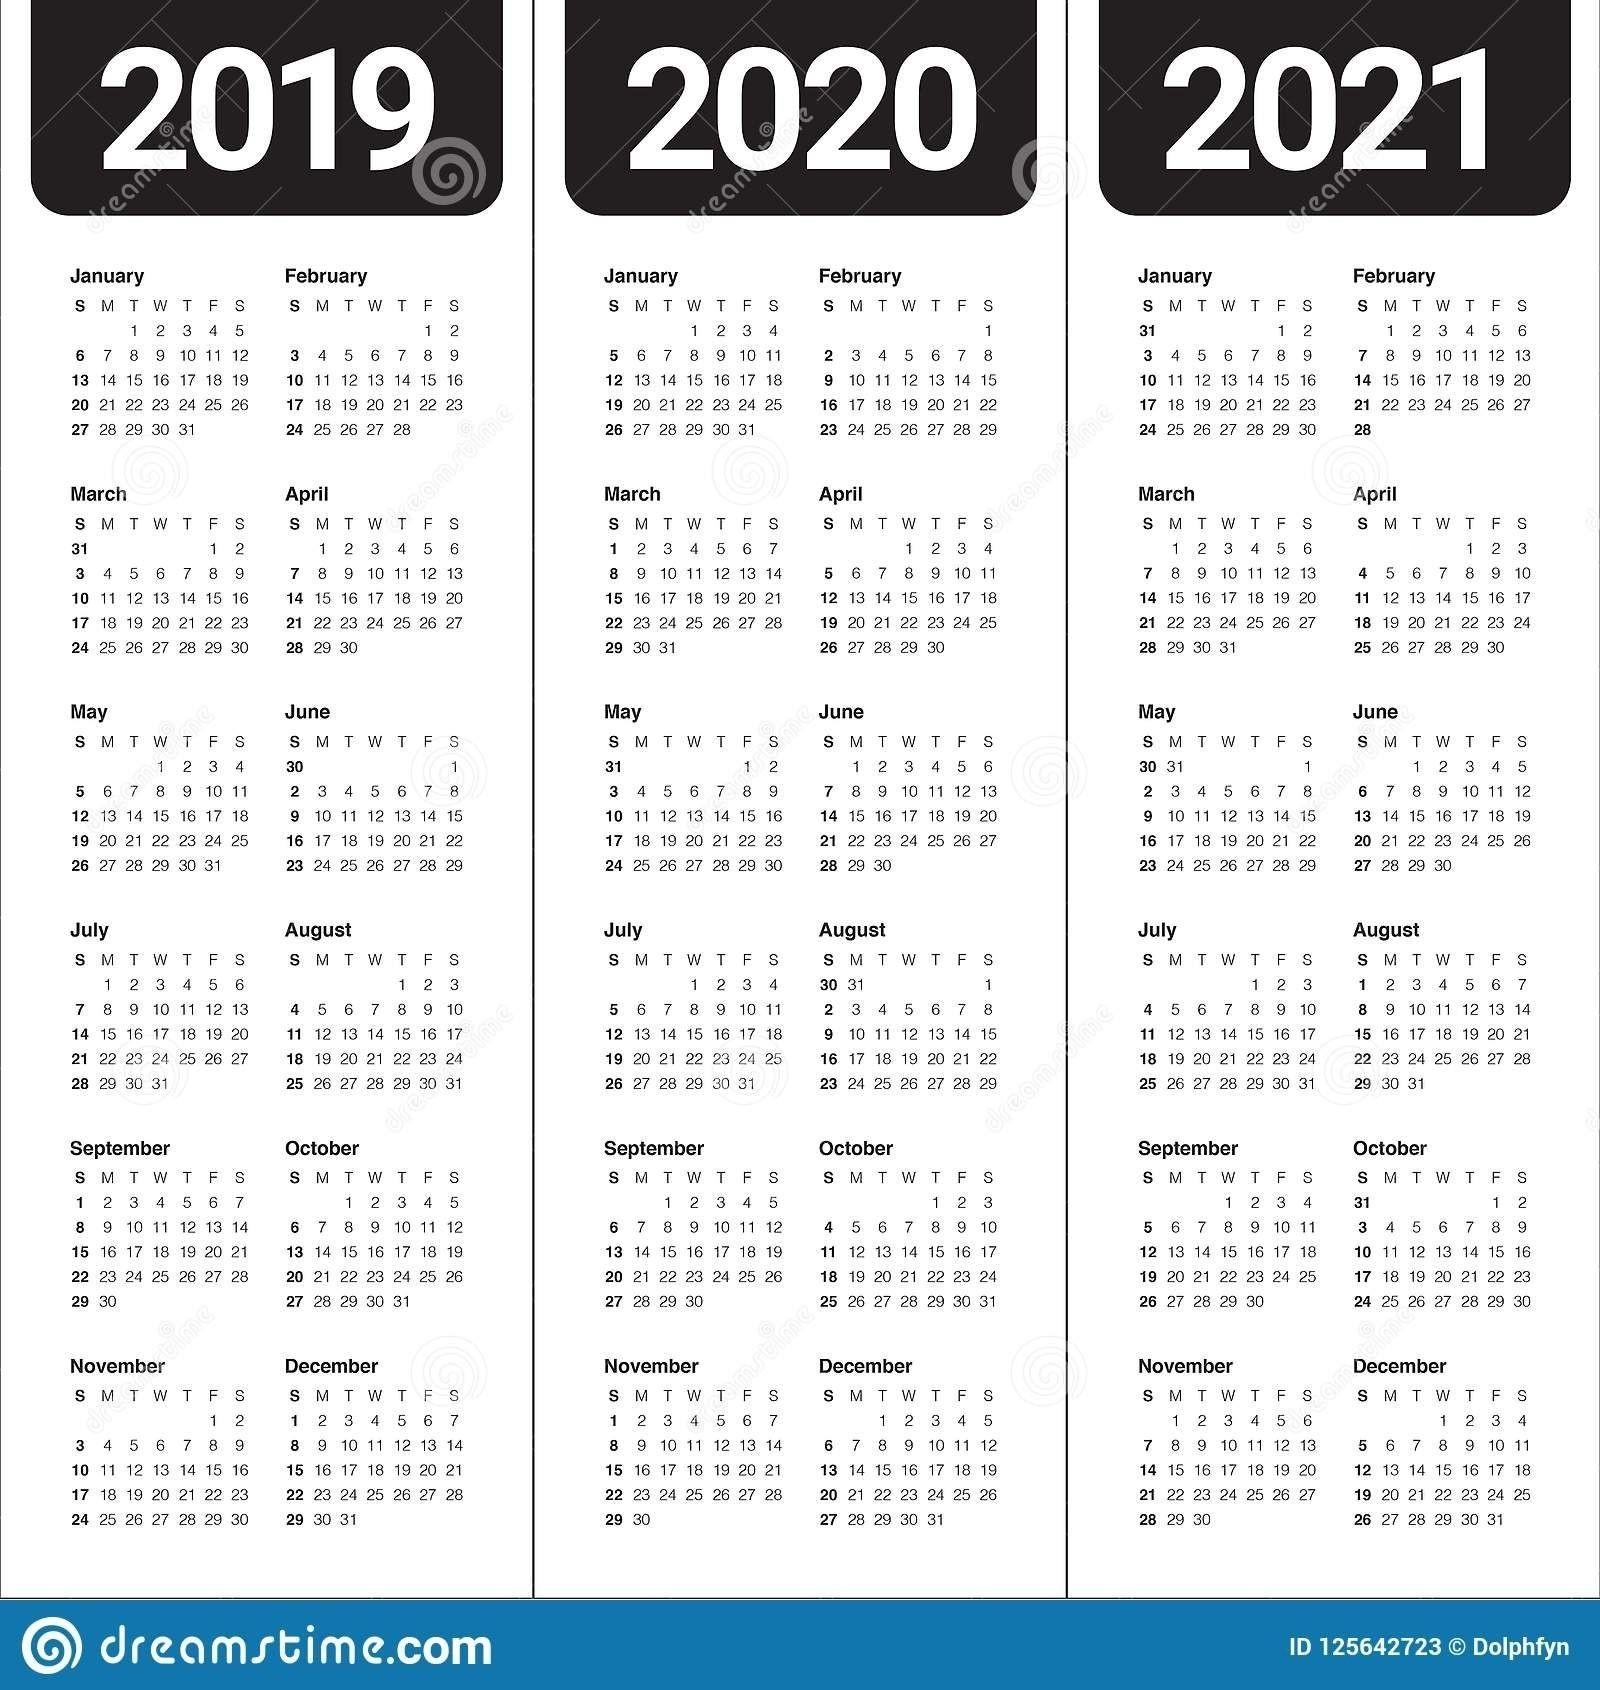 Depo Provera Calendar 2021 Calculator - Template Calendar